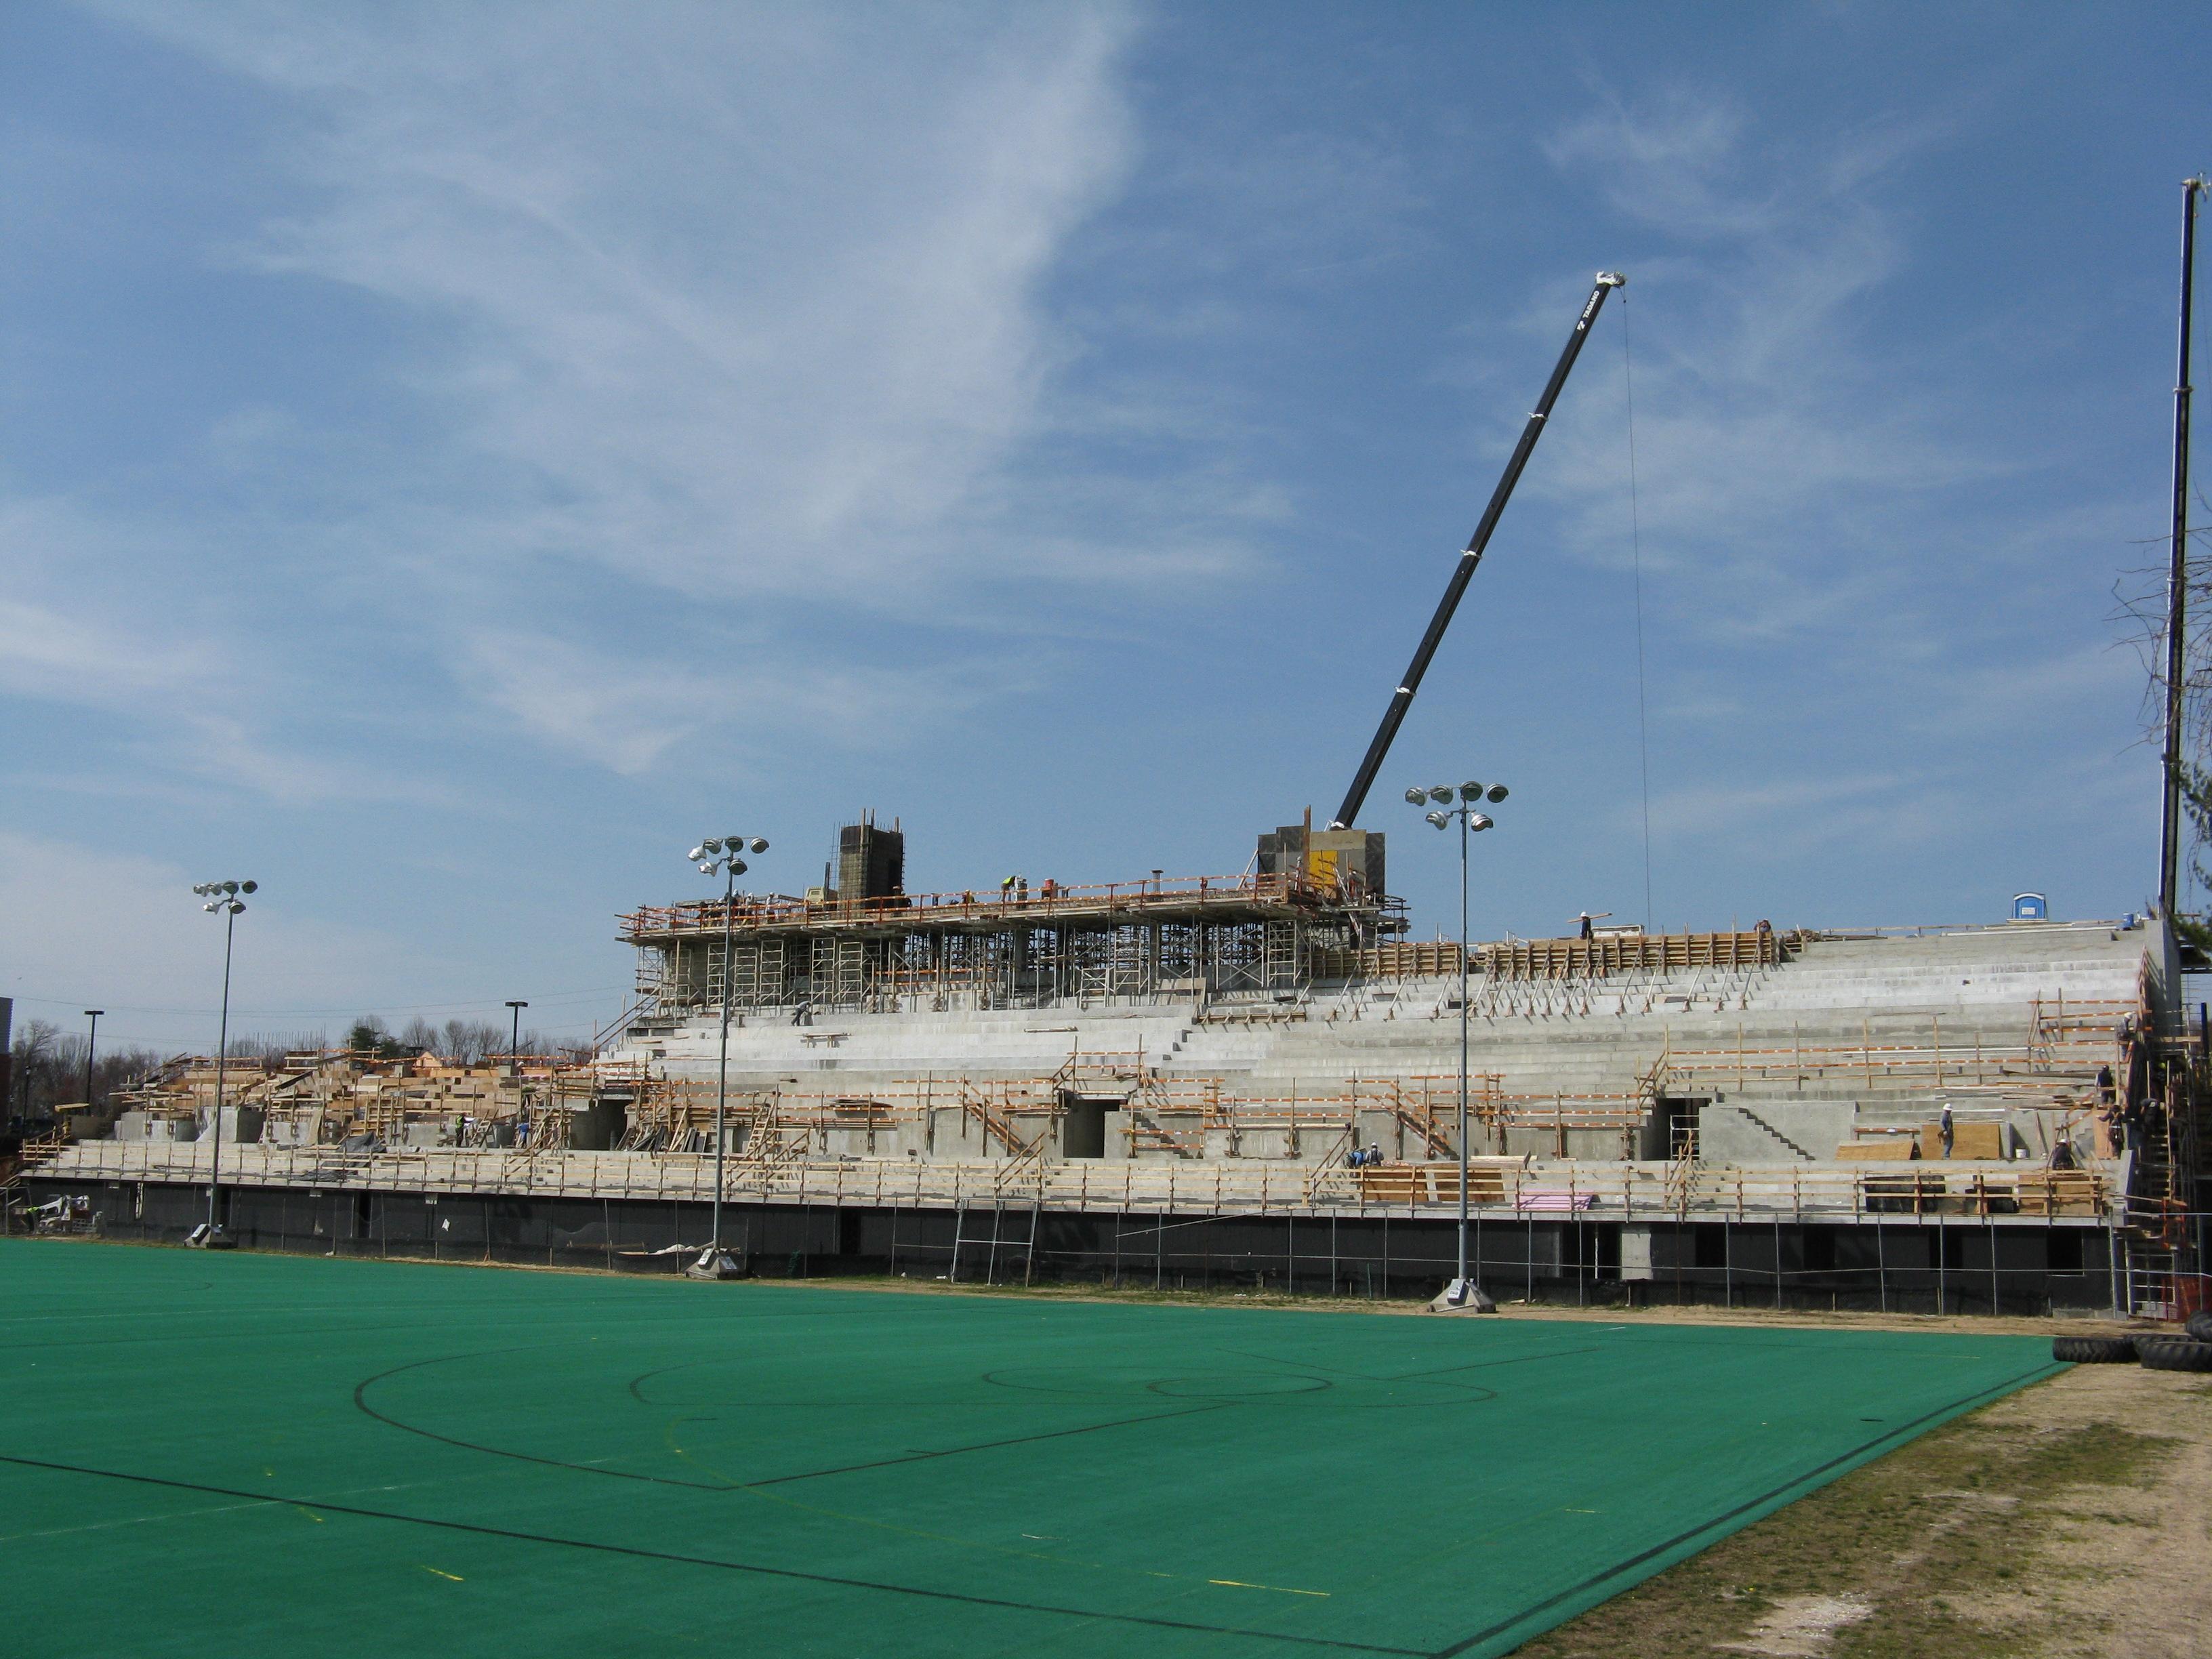 Stevenson University Stadium